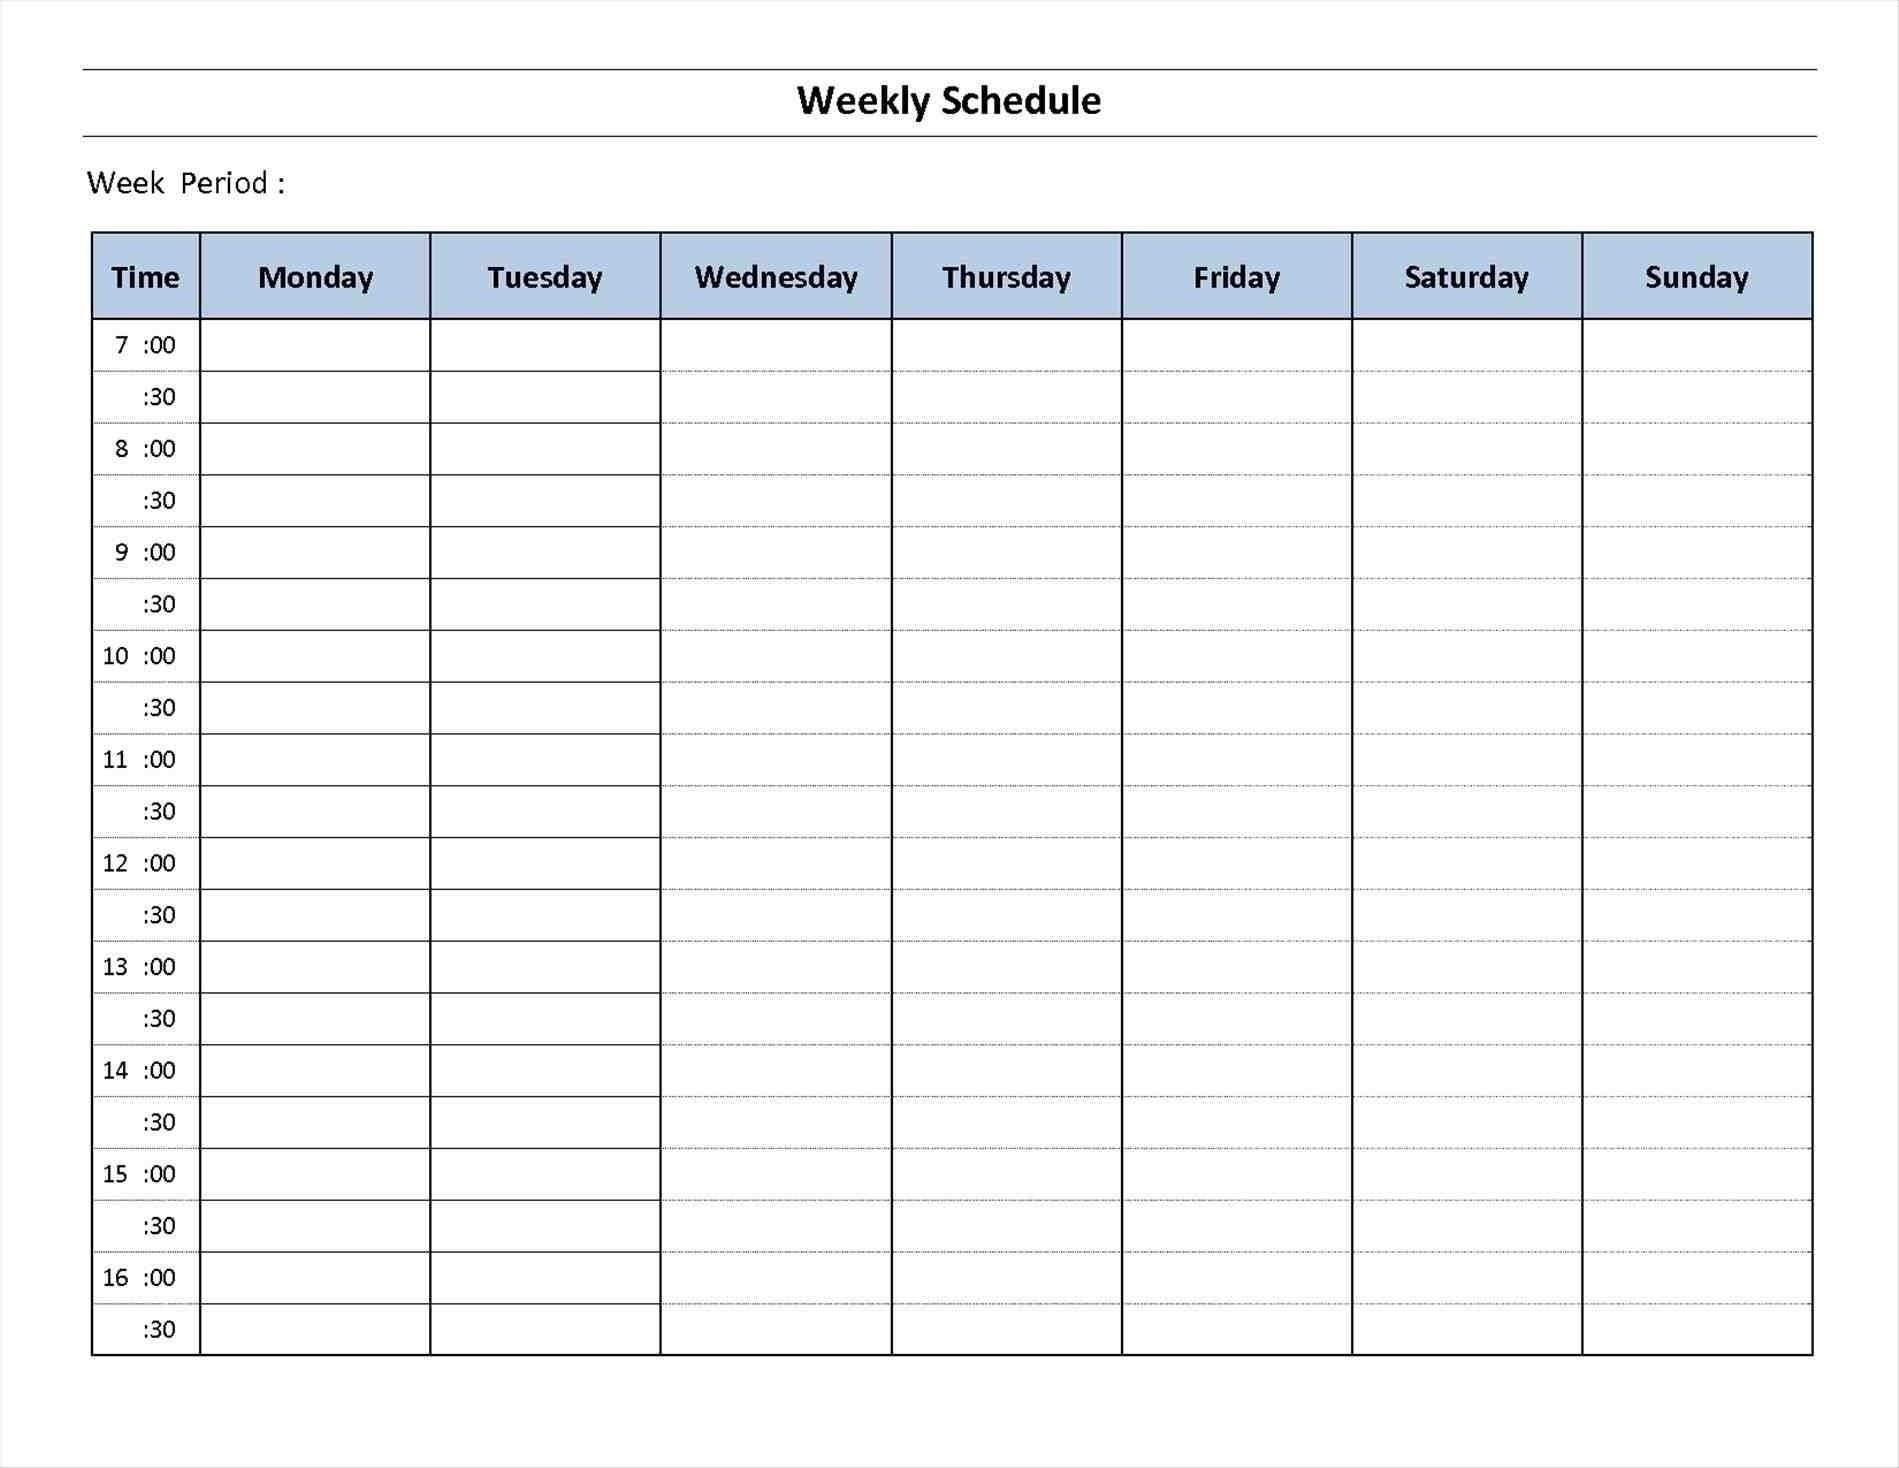 Day Weekly Planner Template Schedule Week Calendar Printable | Smorad intended for 7 Day Weekly Planner Template Printable